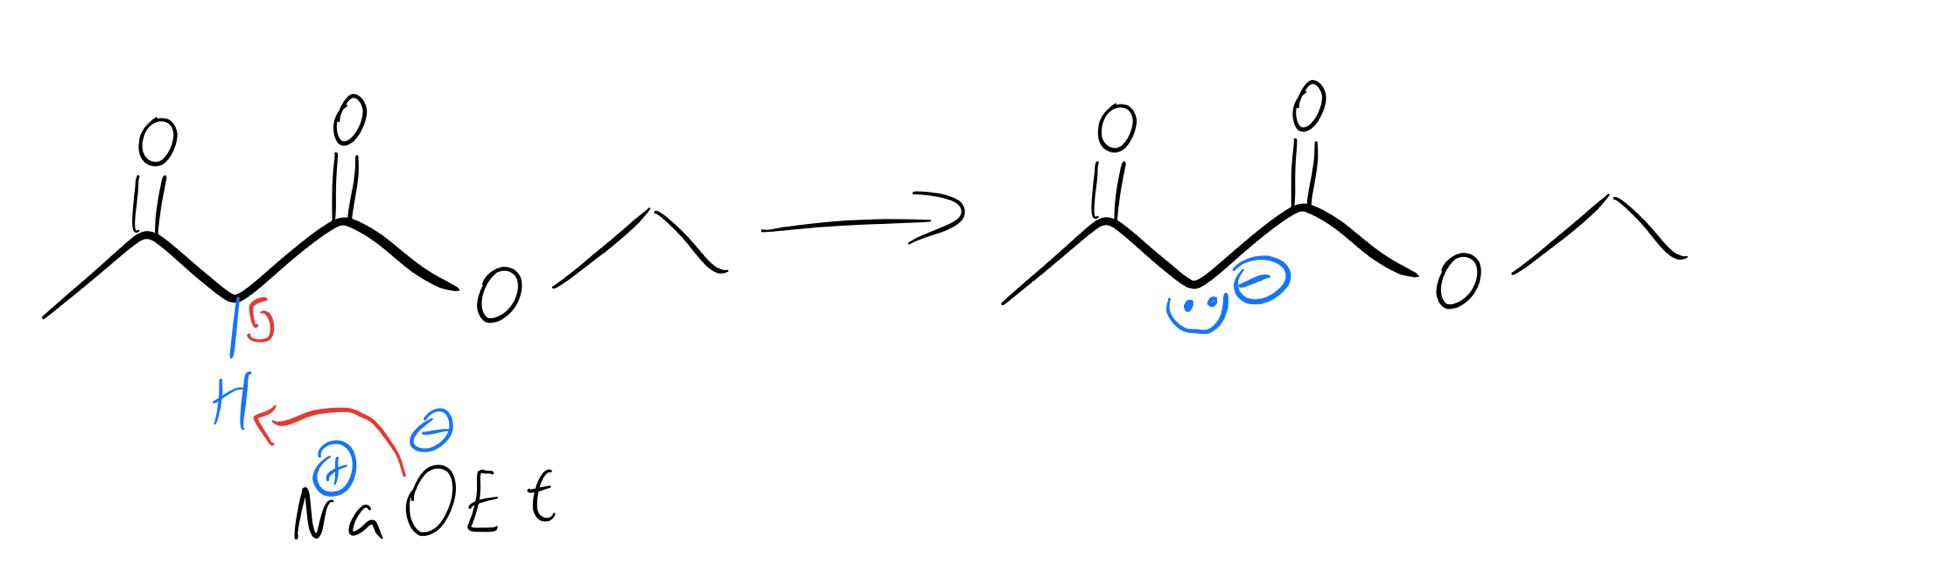 Methylene-enolate-formation